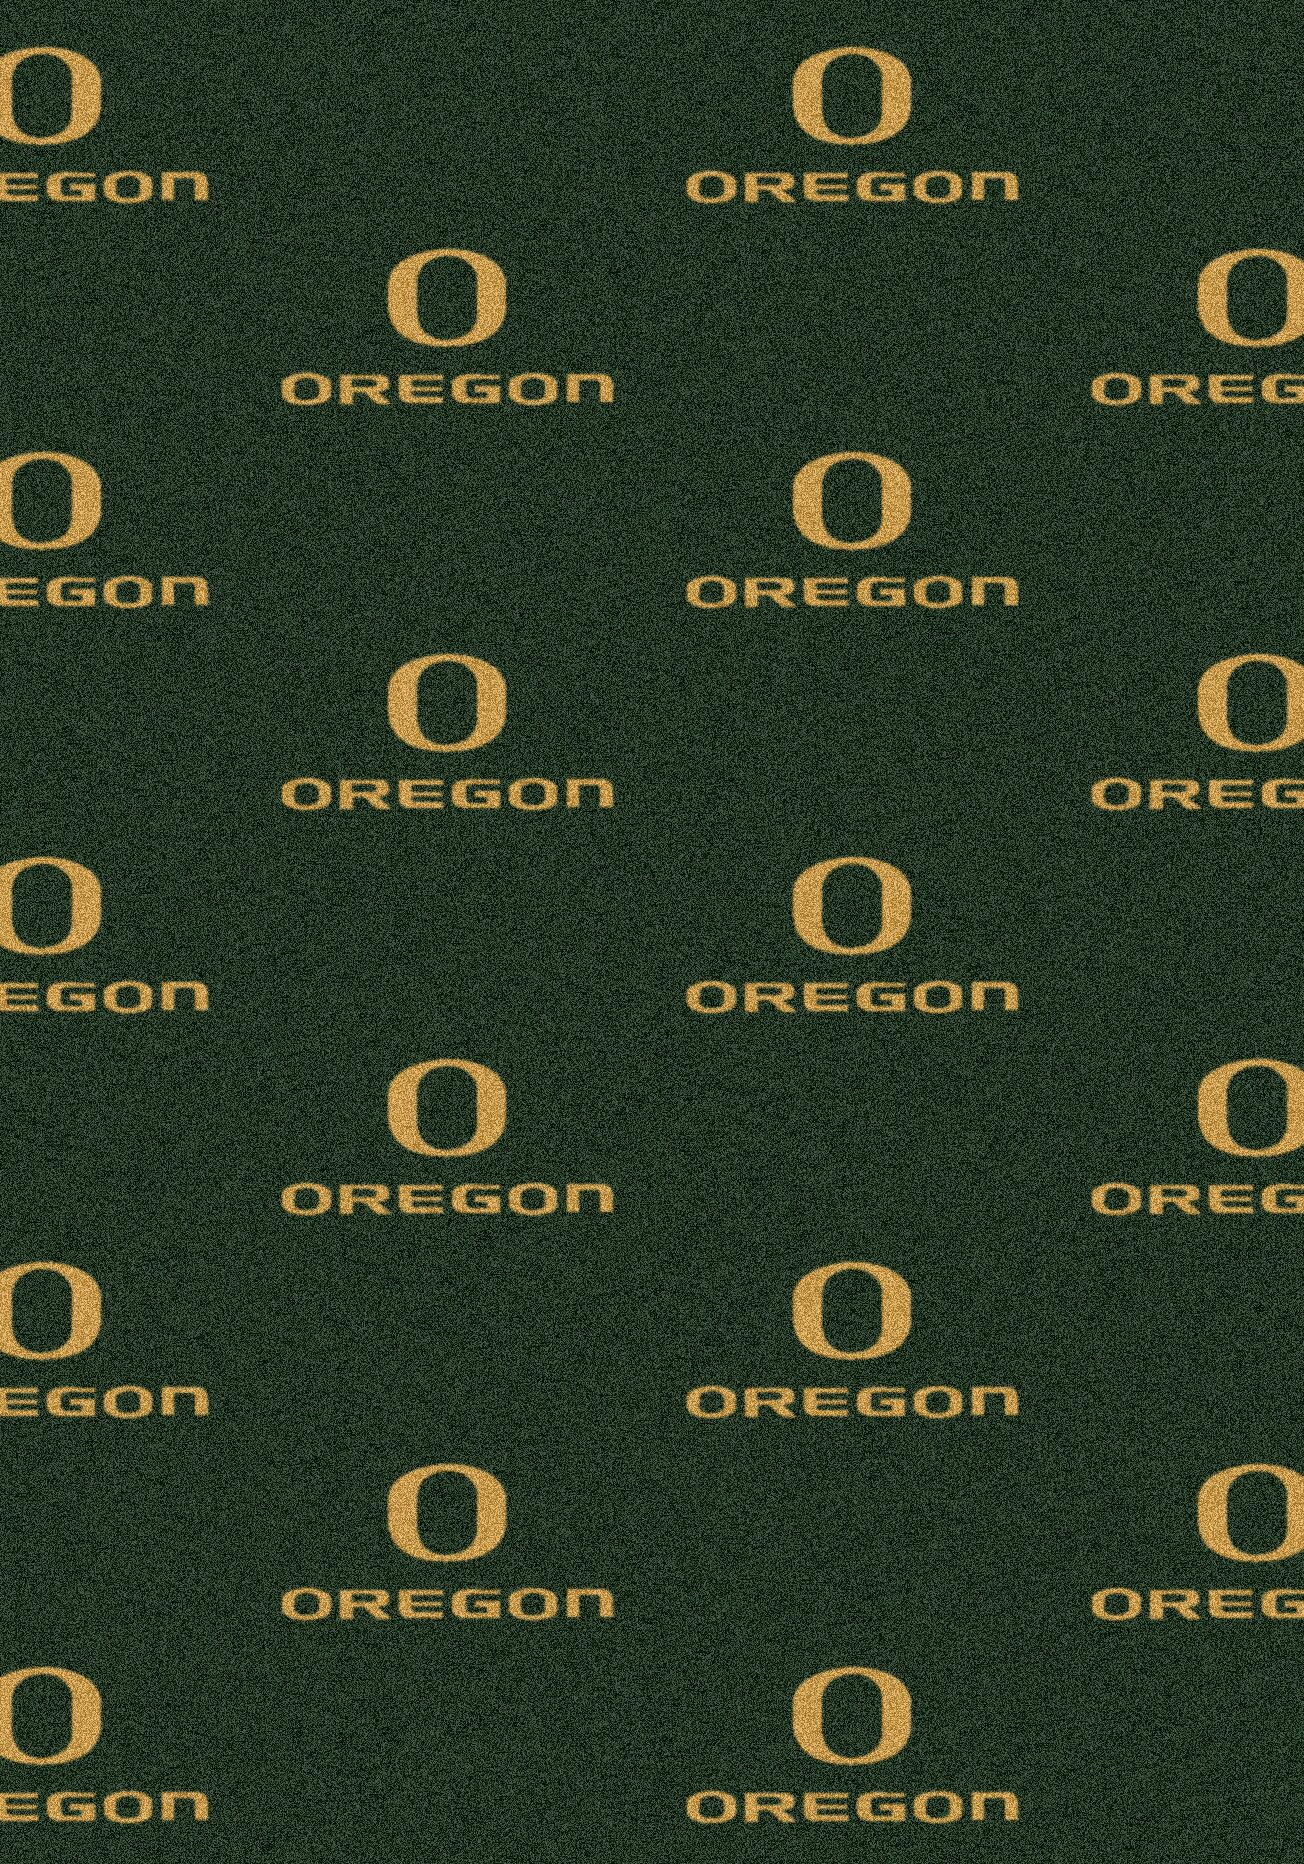 NCAA Team Repeating Novelty Rug NCAA Team: University of Oregon